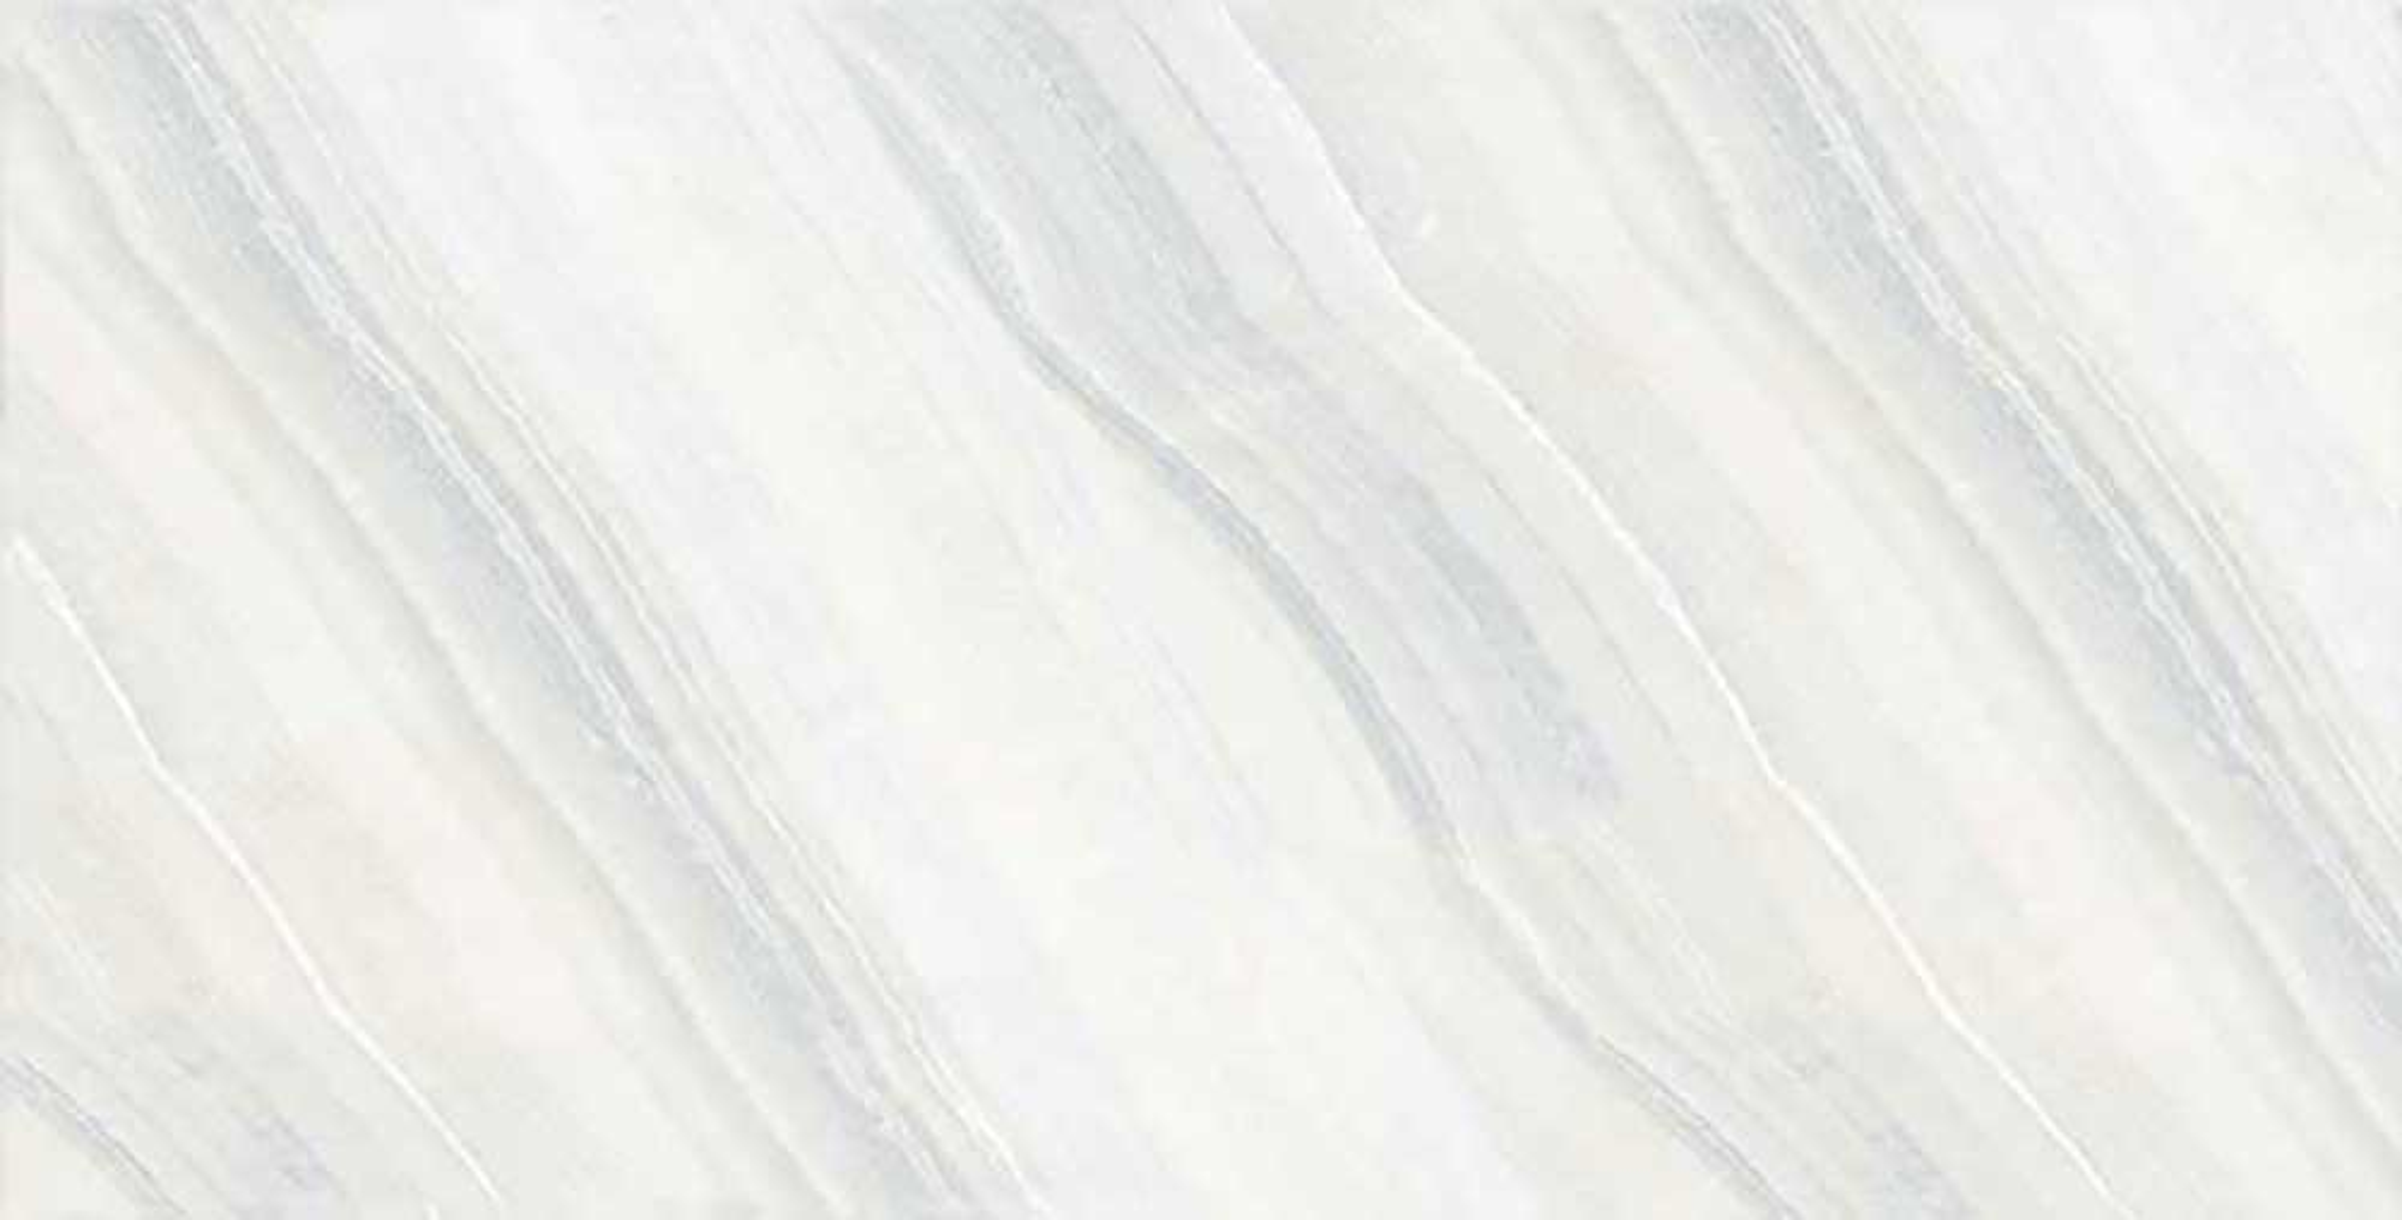 White Lily, Digital - 30x60 cm, Wall Tiles, Glossy